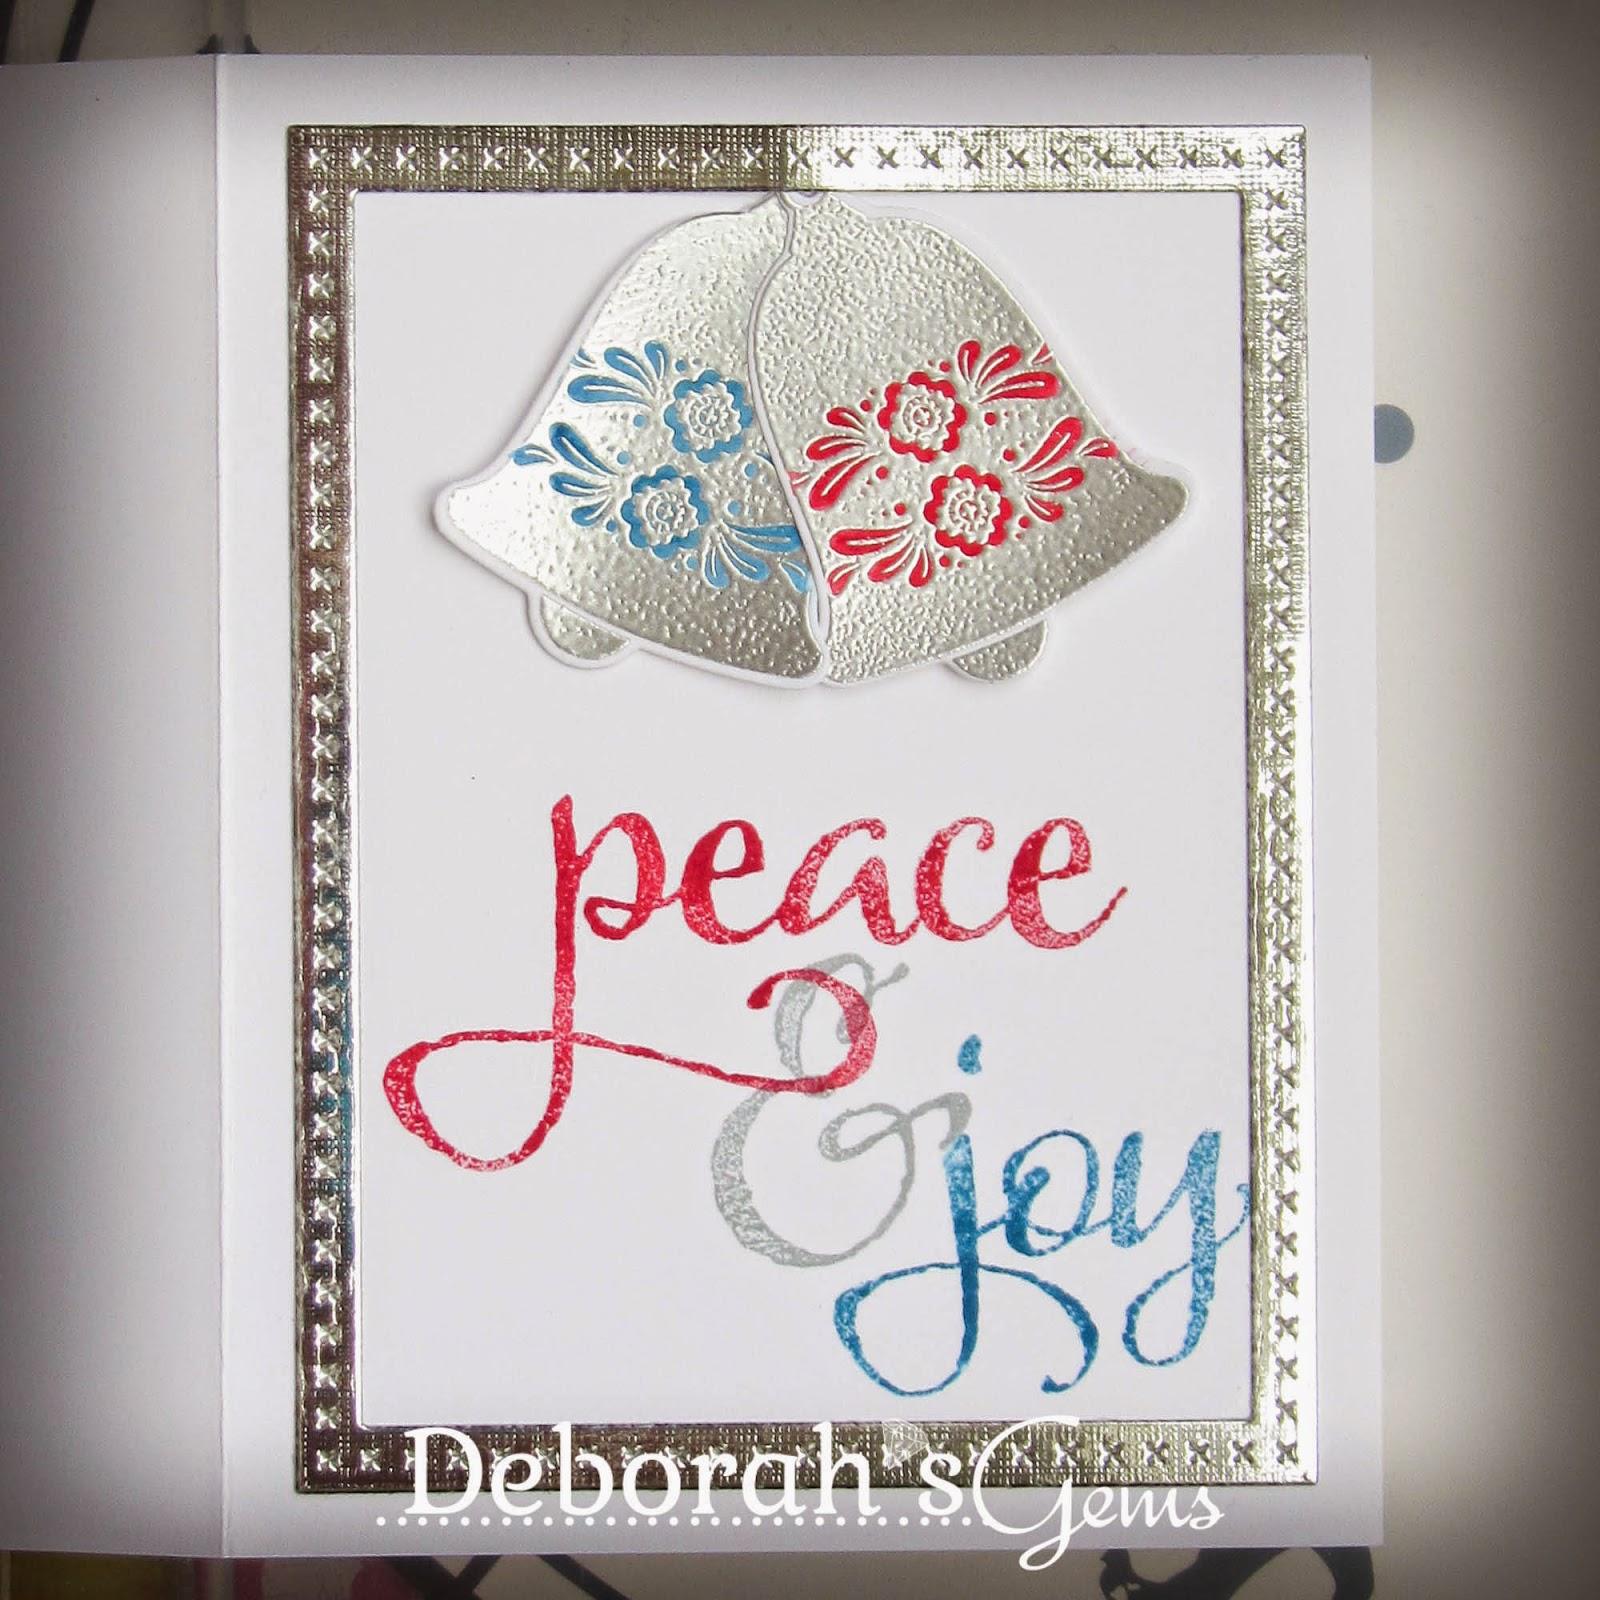 Peace & Joy sq - photo by Deborah Frings - Deborah's Gems